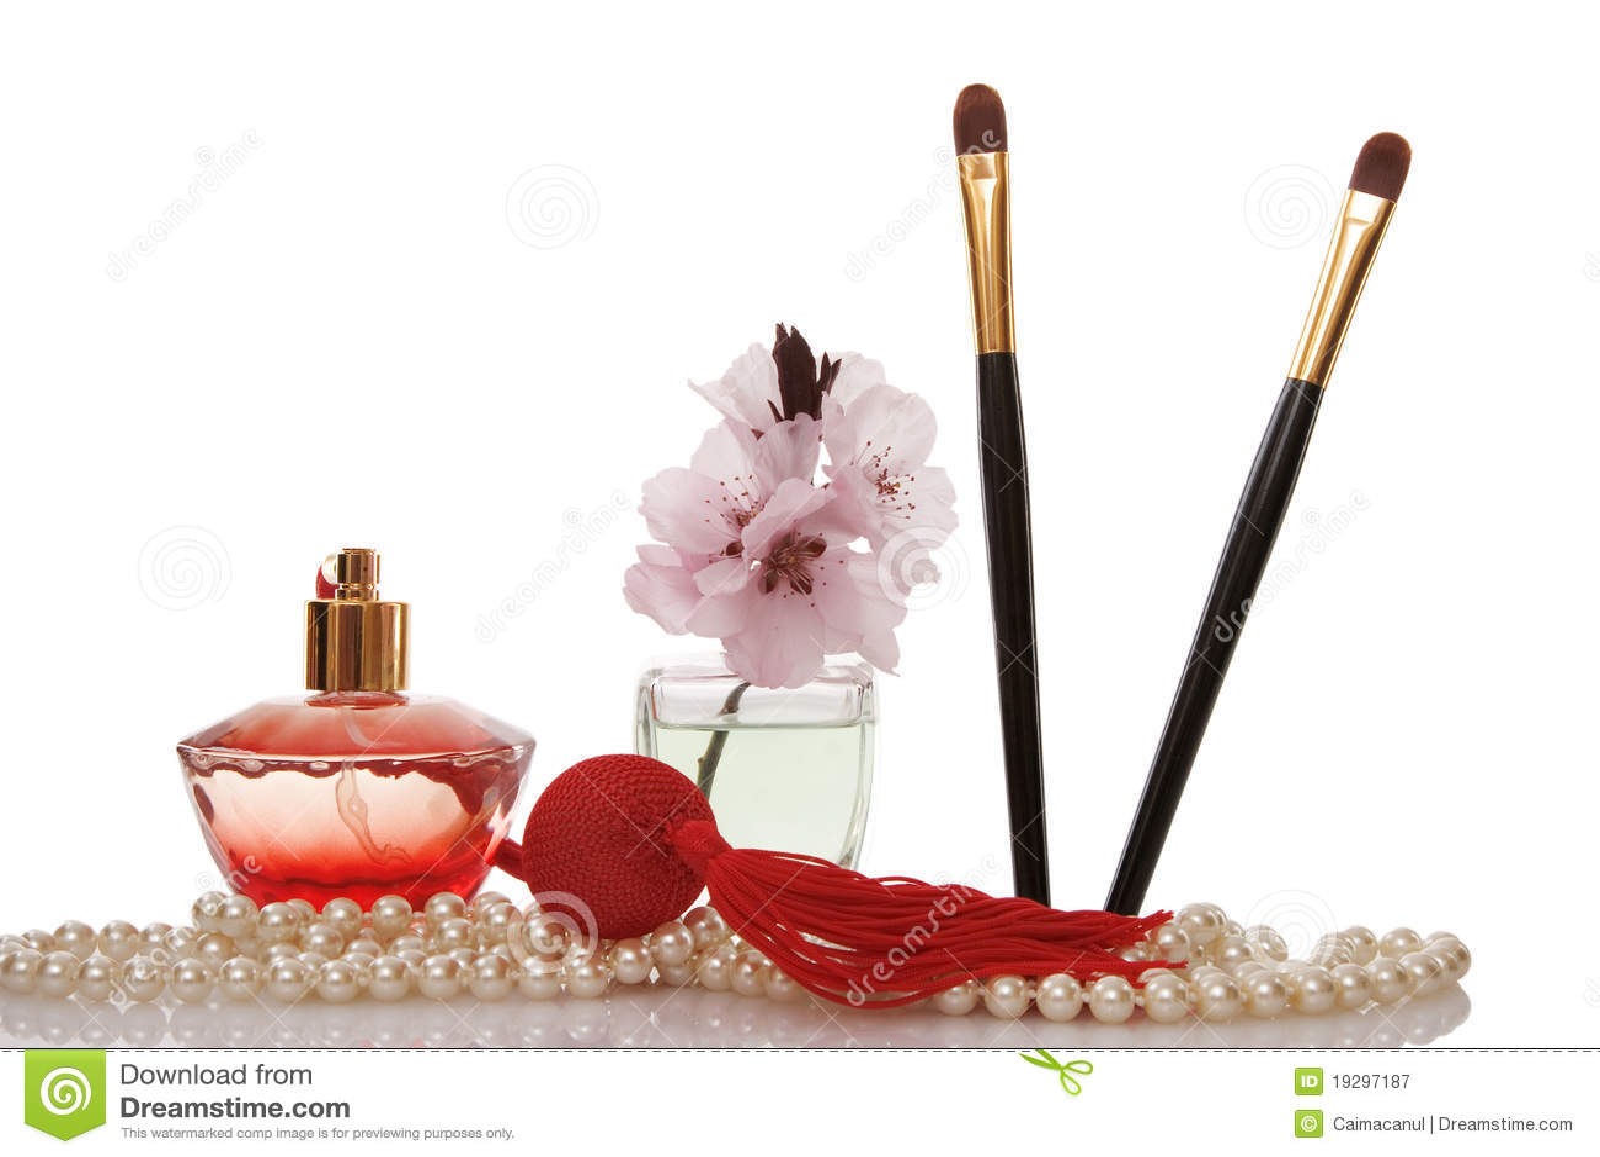 Perlen bördelt, parfümiert, der Pinsel mit zwei Kosmetik